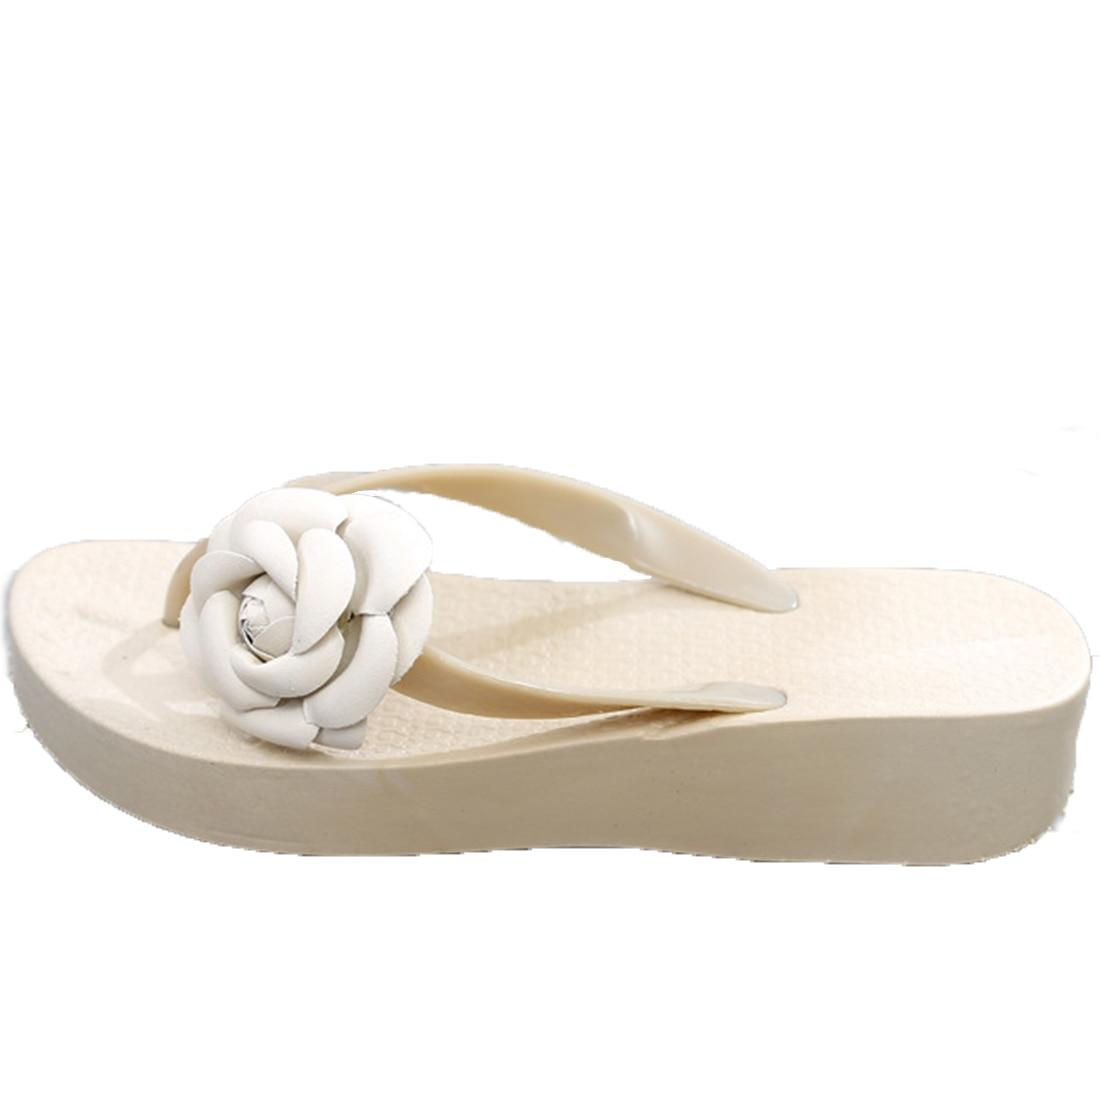 Women sandals 2017 New Summer Shoes Platform Slippers wedges flip flops lady's flower slippers Shoes Woman phyanic 2017 summer women sandals platform wedges sandals hook